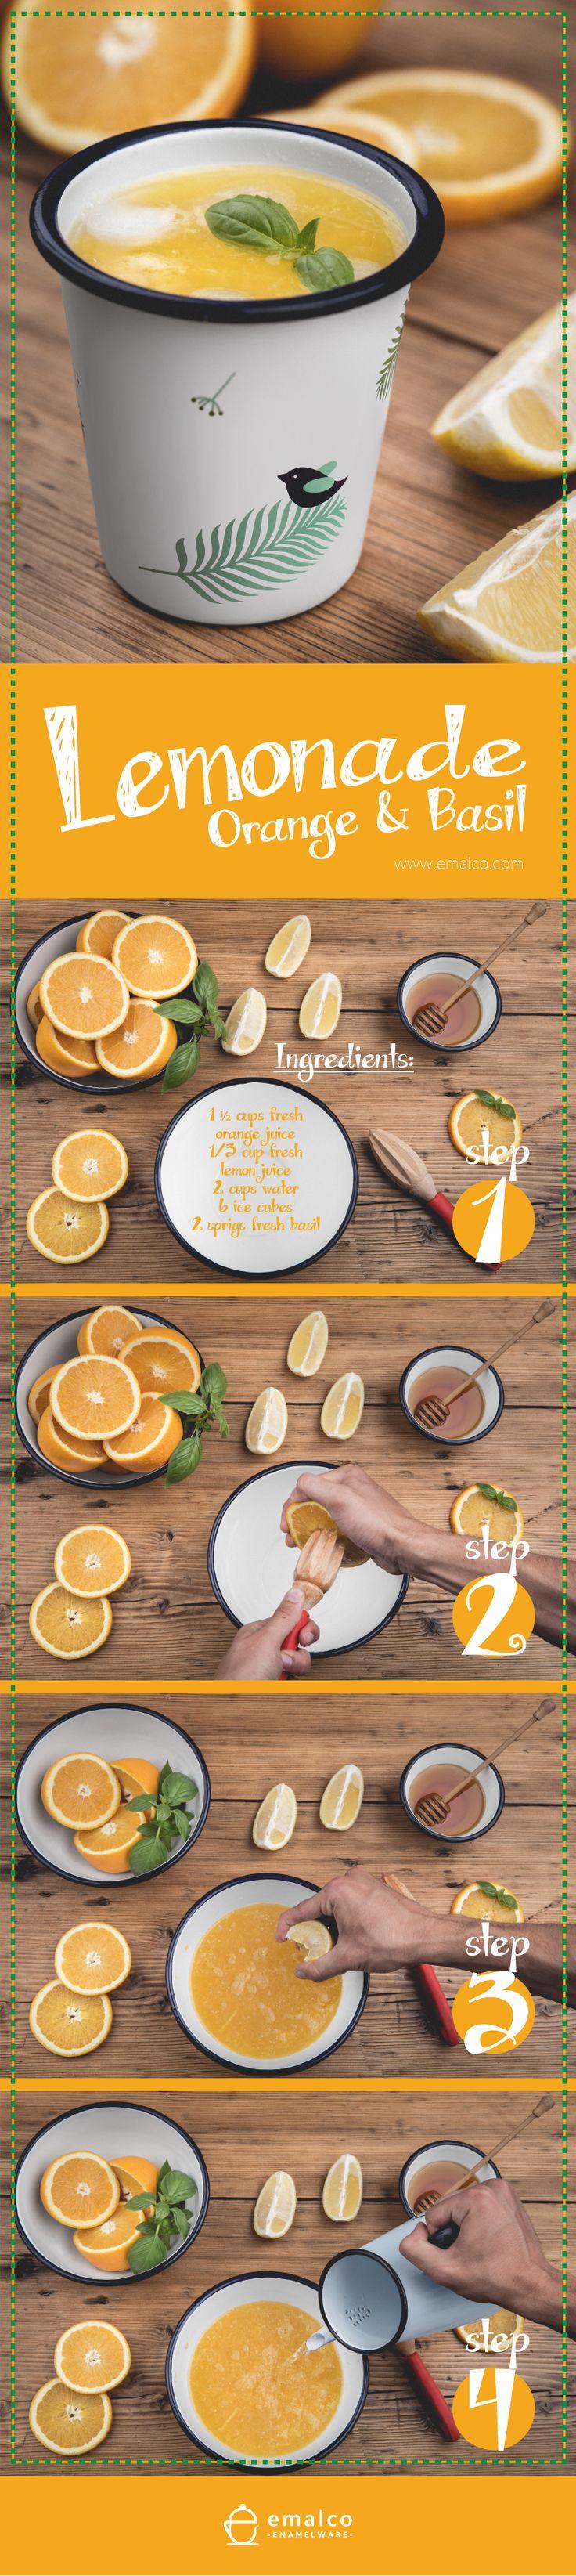 Summer is going to end soon, too soon for us, unfortunately. Let's celebrate last few warm days!   Orange Lemonade 1 ½ cups fresh orange juice  1/3 cup fresh lemon juice  2 cups water 6 ice cubes 2 sprigs fresh basil